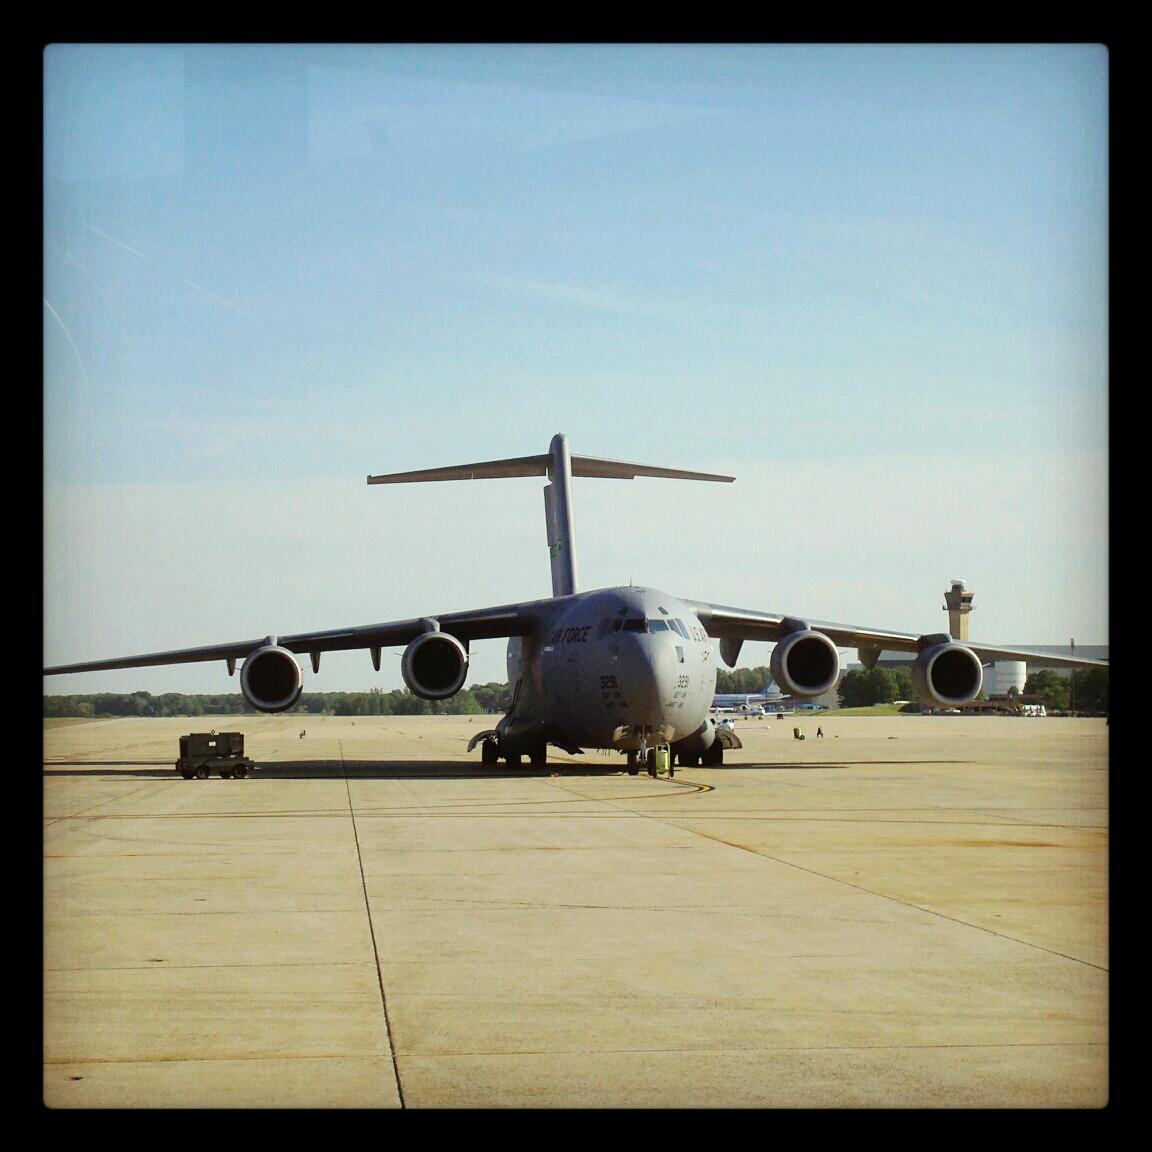 Our C-17 transport back at Andrews Air Force Base, Md., on April 27.